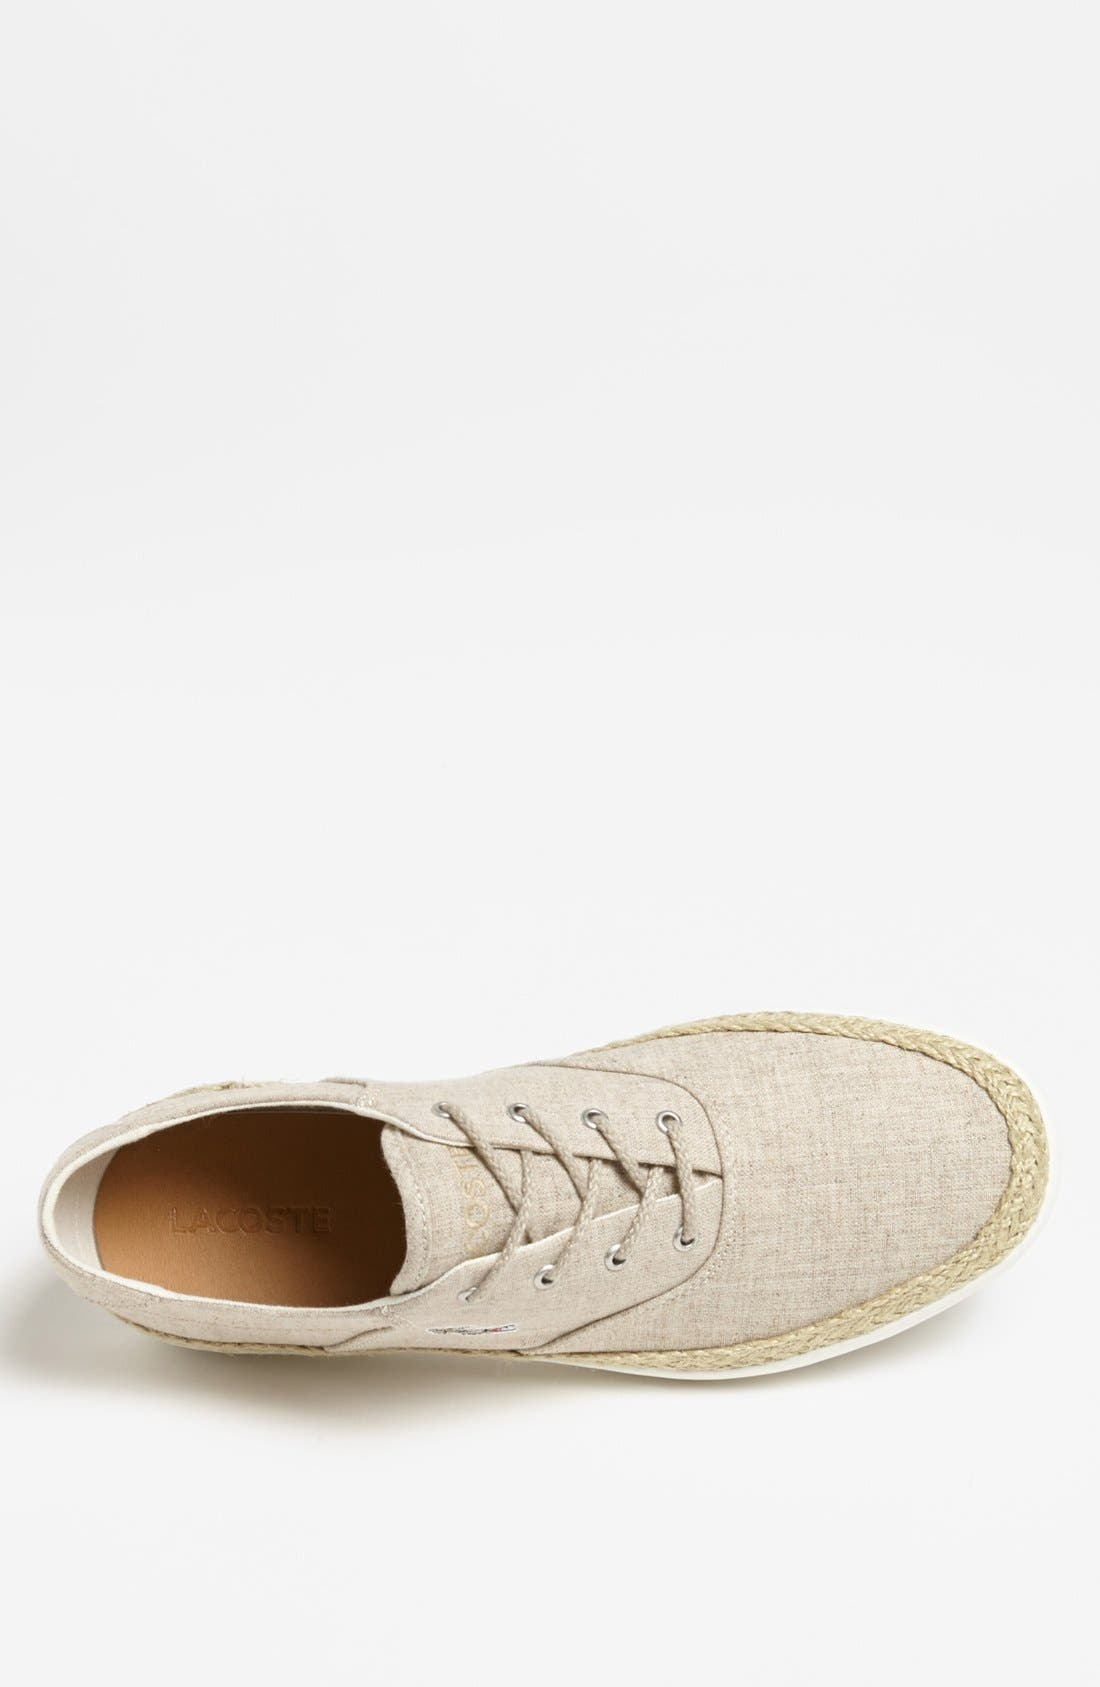 Alternate Image 3  - Lacoste 'Glendon' Sneaker (Men)